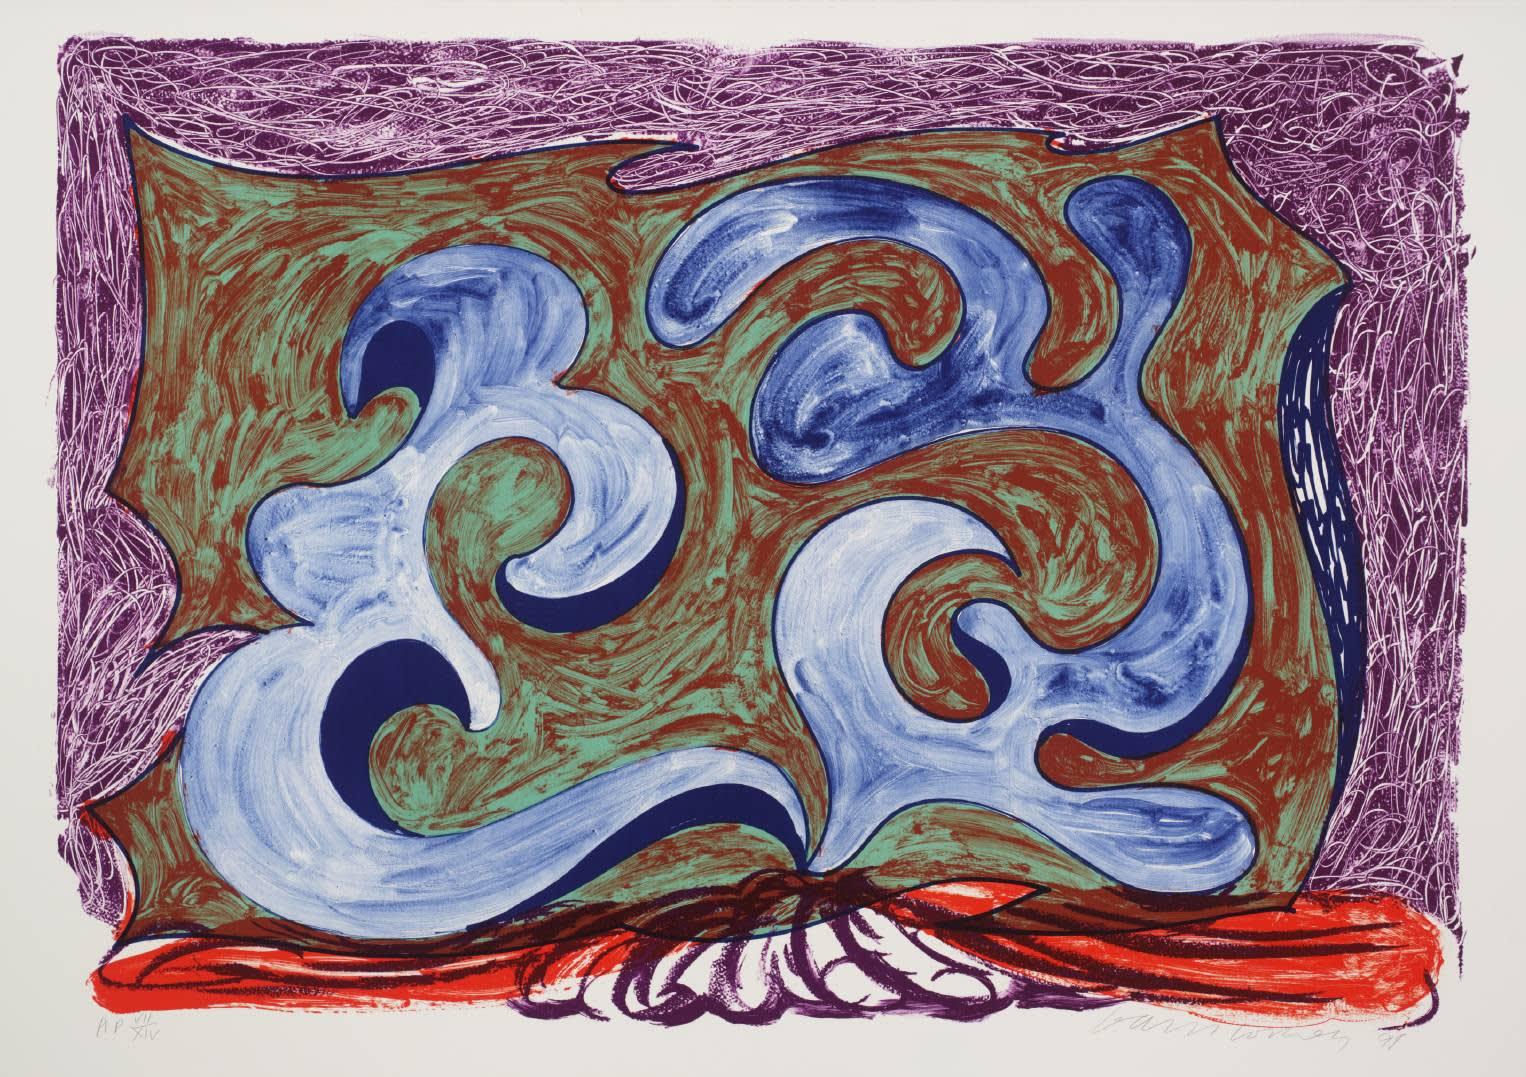 David Hockney Rampant Lithograph on Paper